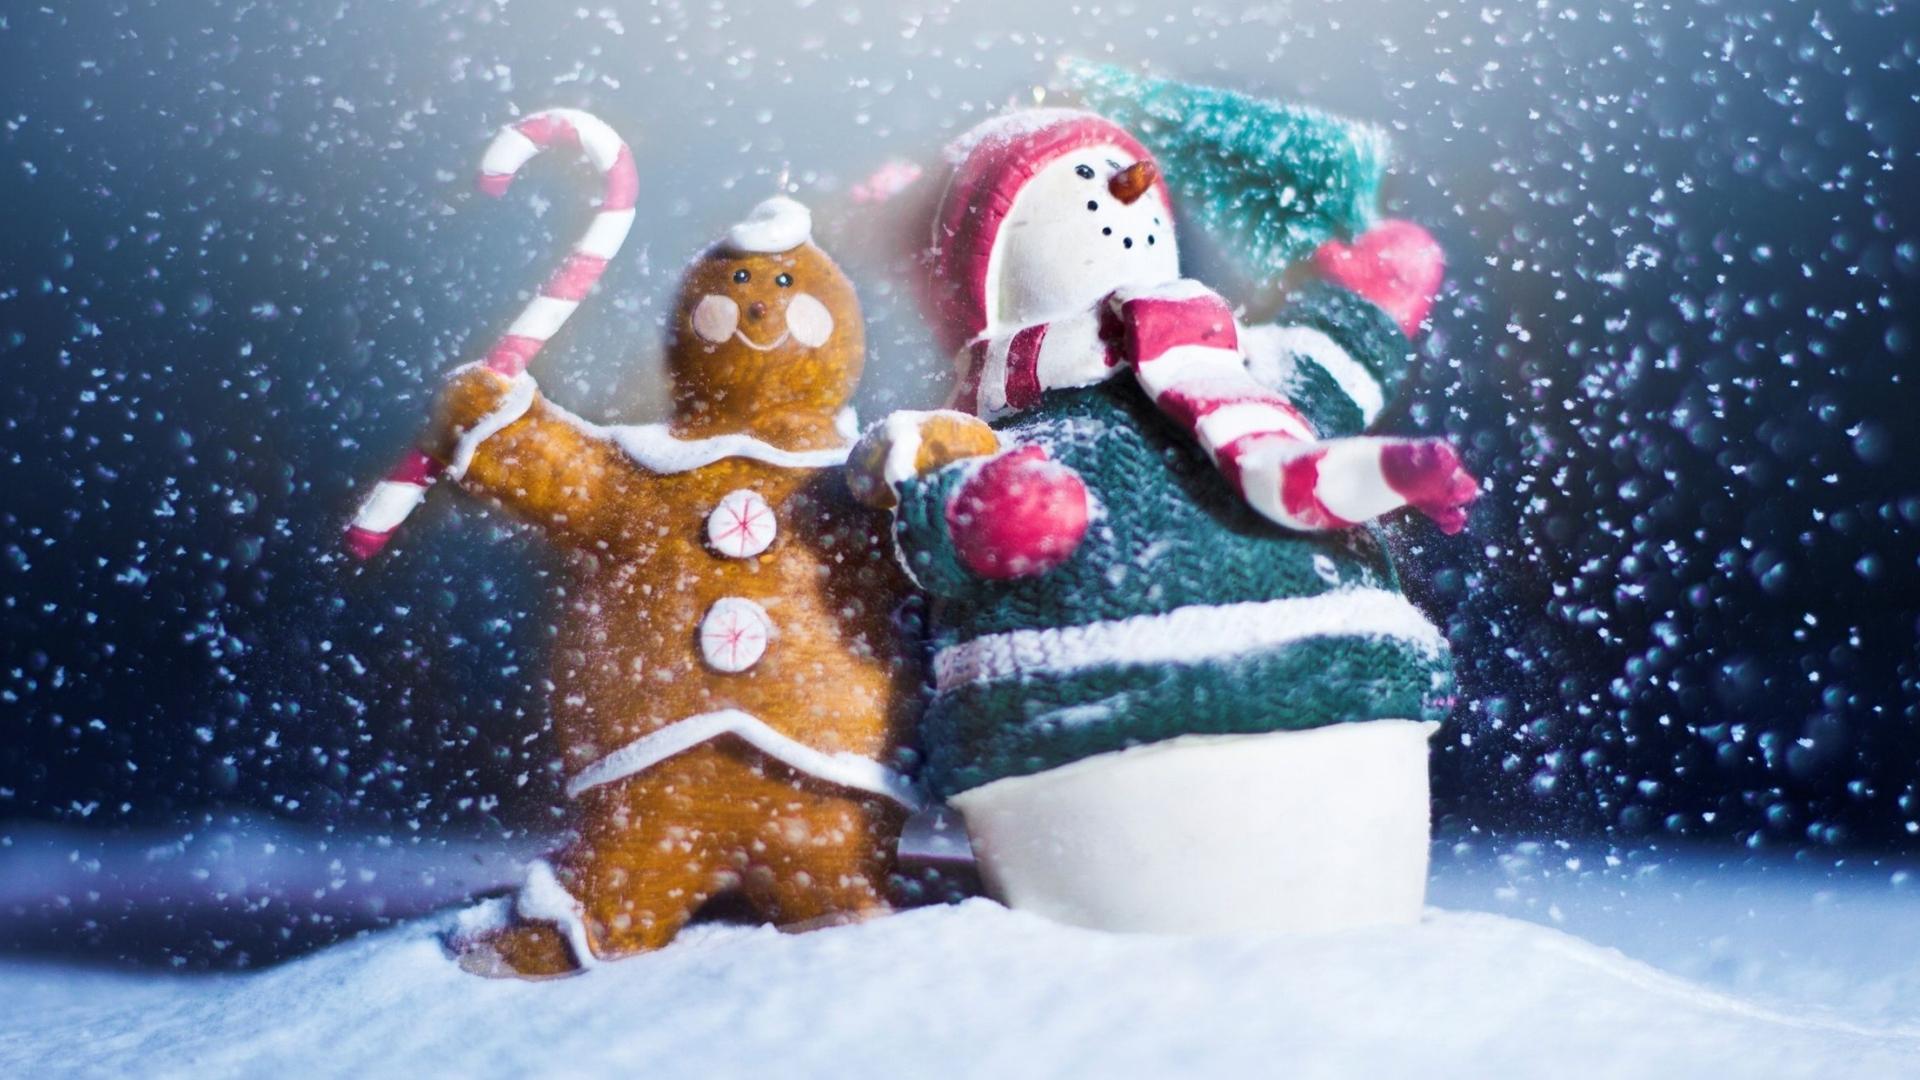 Christmas Backgrounds Best for Kodi 2